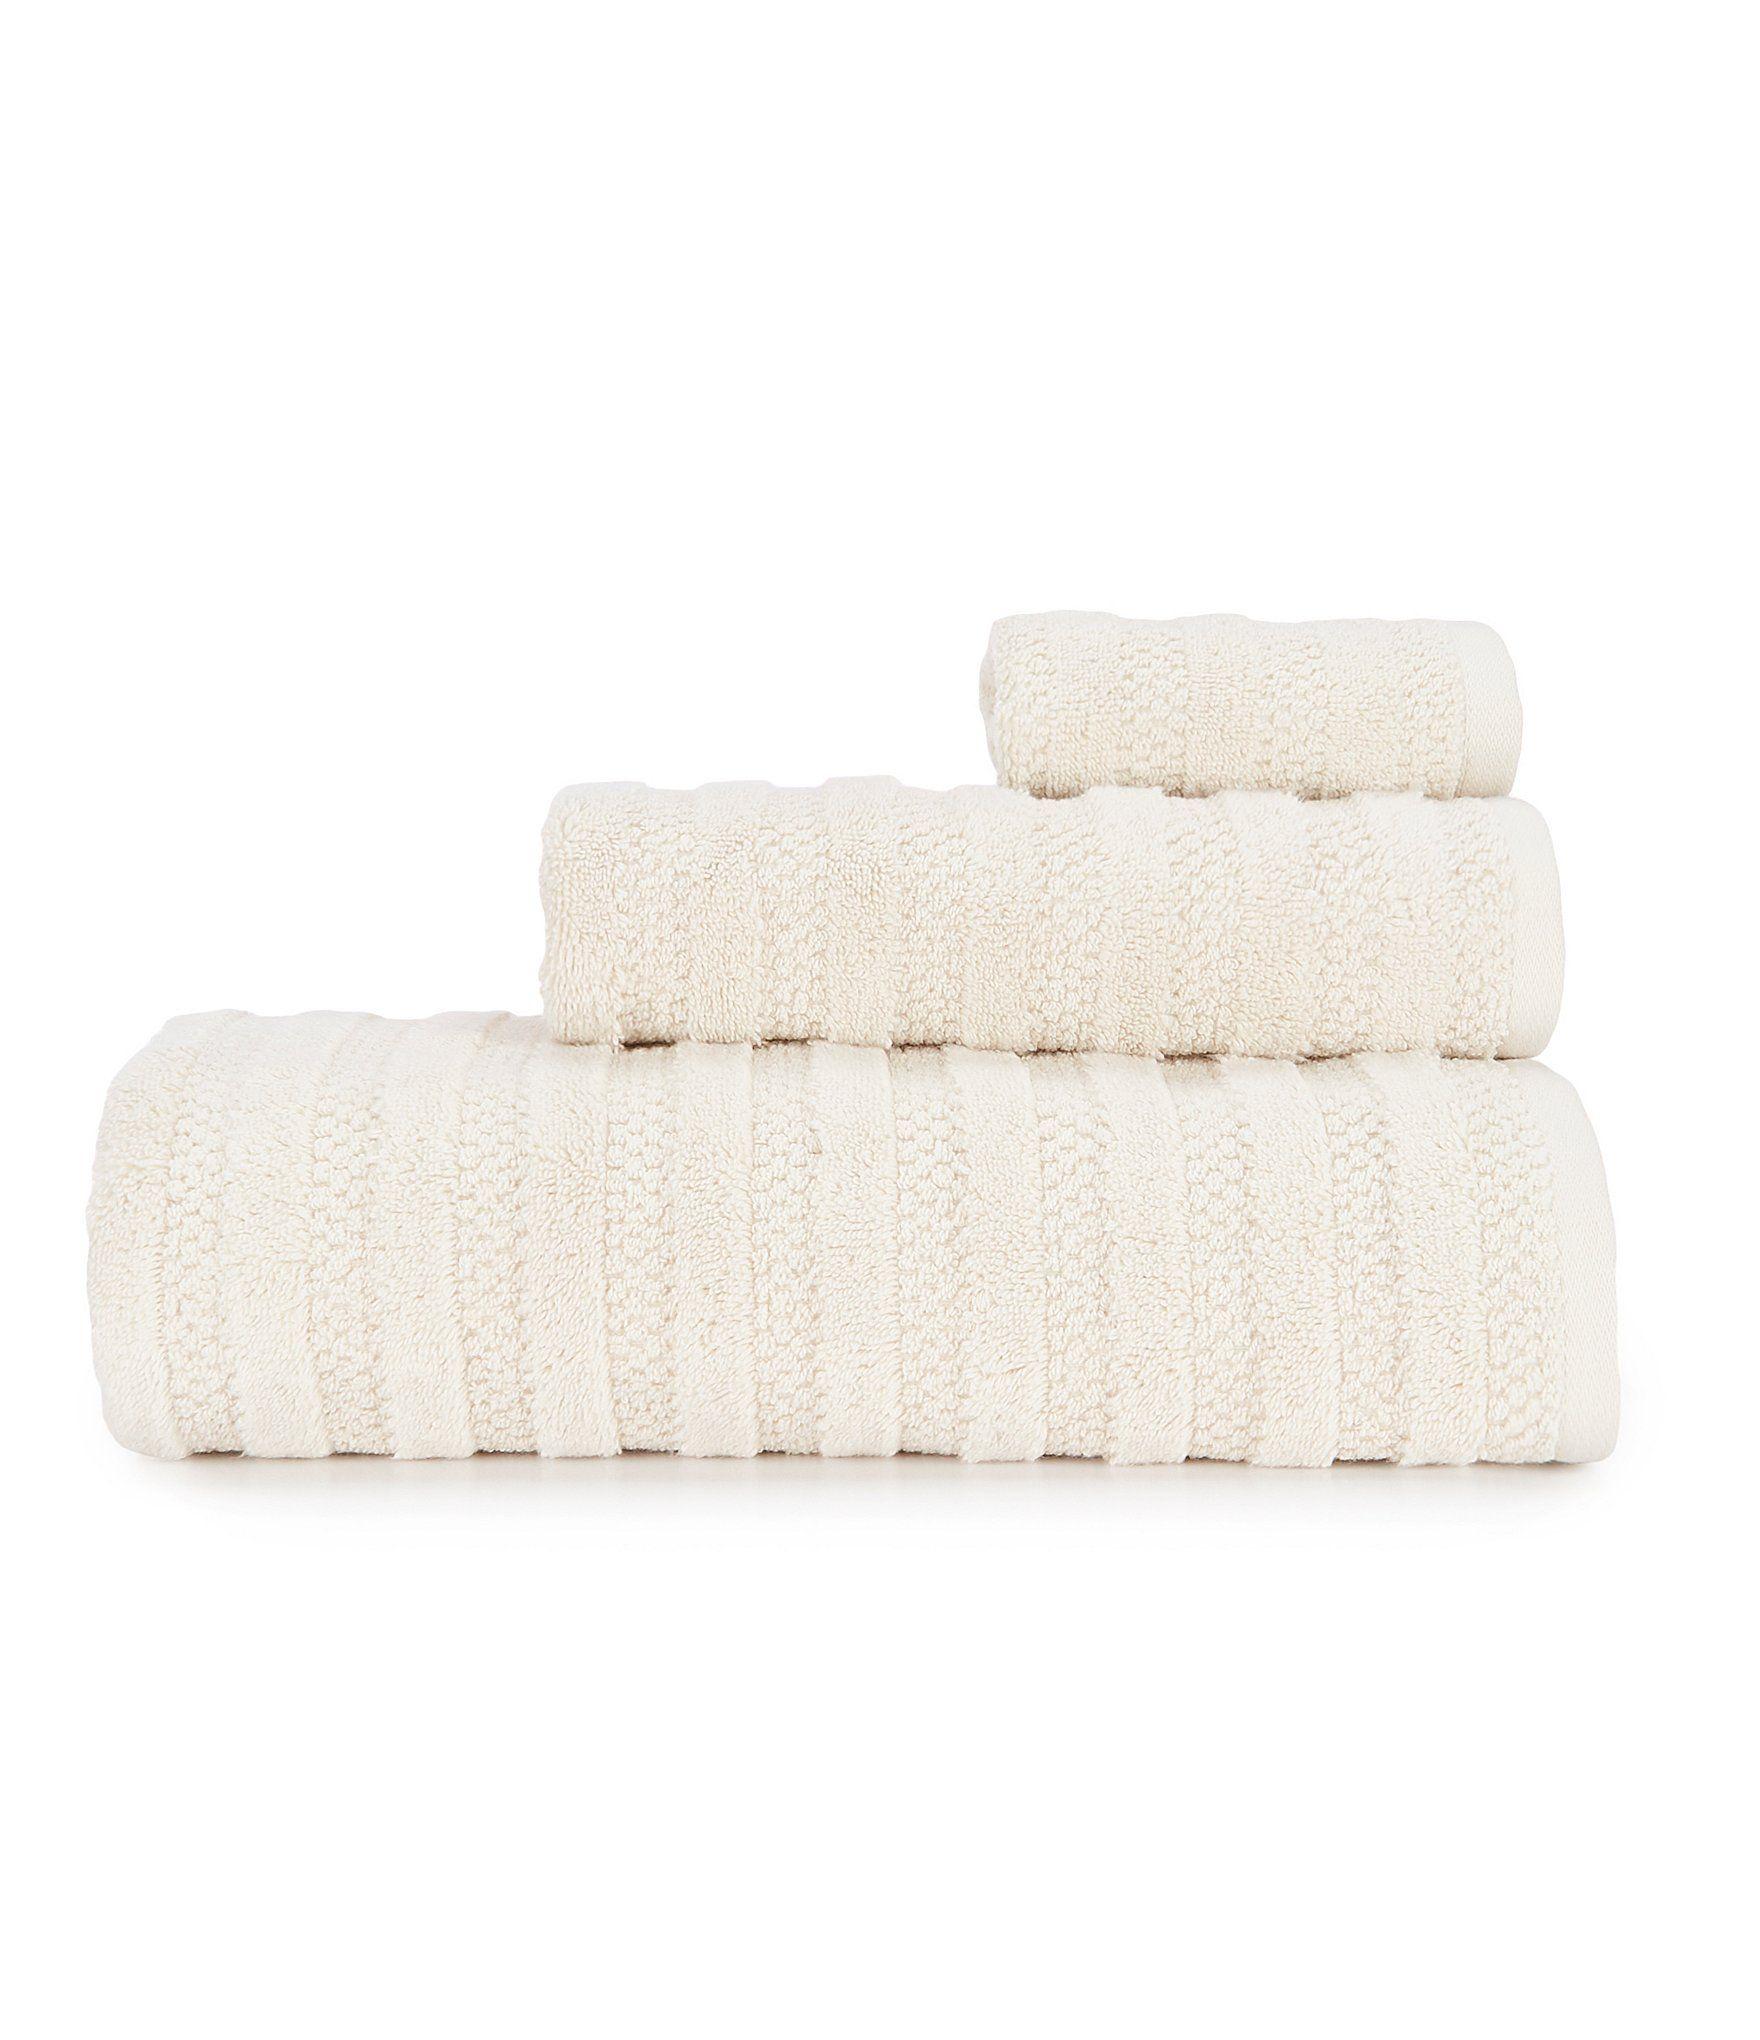 Pin By Jeanie On Interior Striped Bath Towels Bath Towels Towel [ 2040 x 1760 Pixel ]